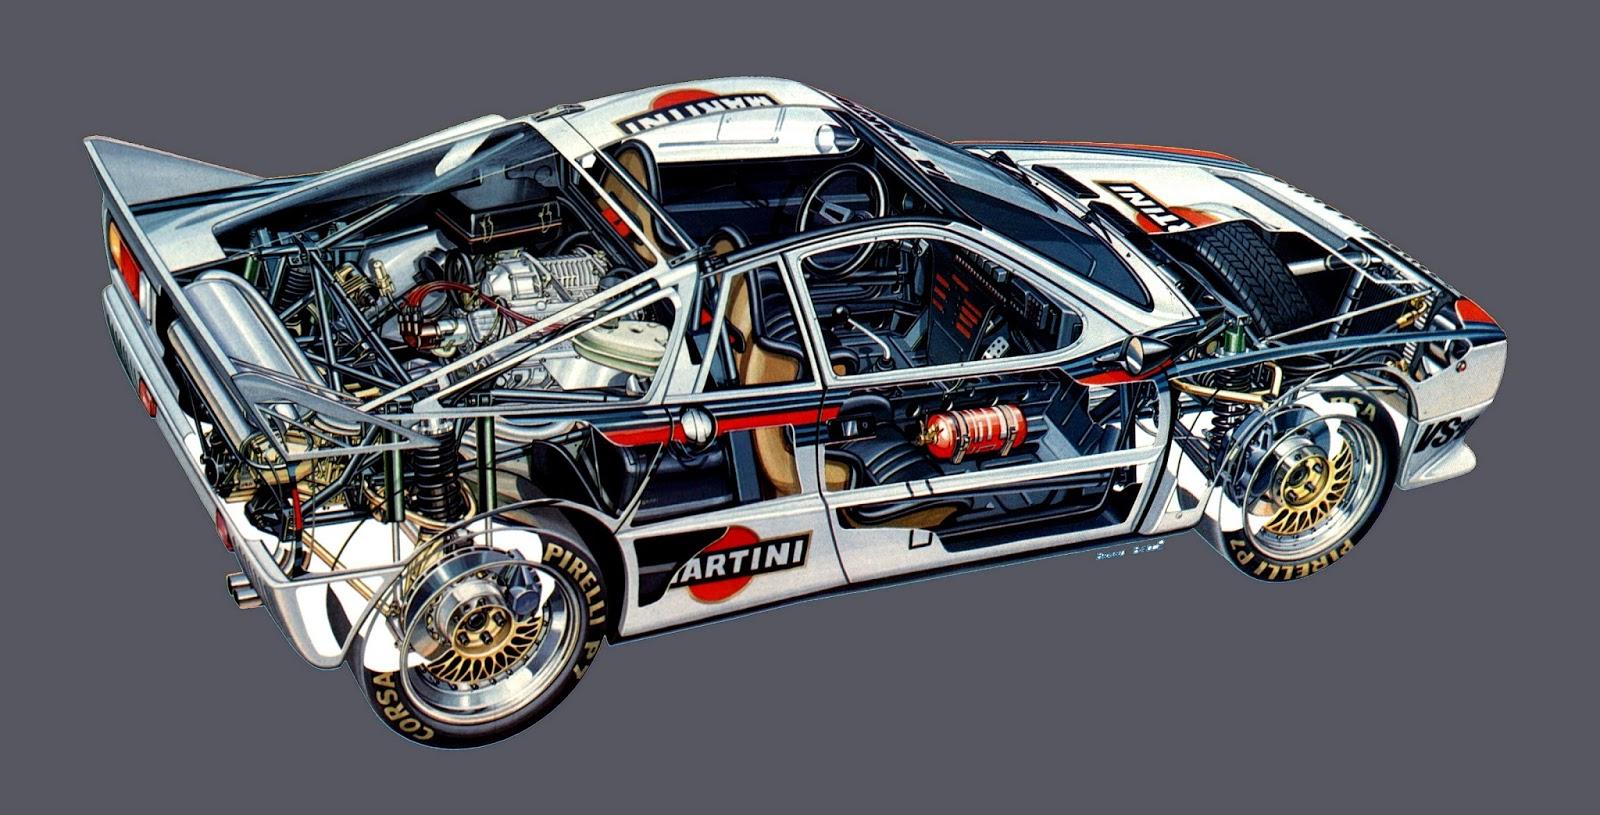 Stormwheels Lancia 037 La Due Ruote Motrici Mondiale